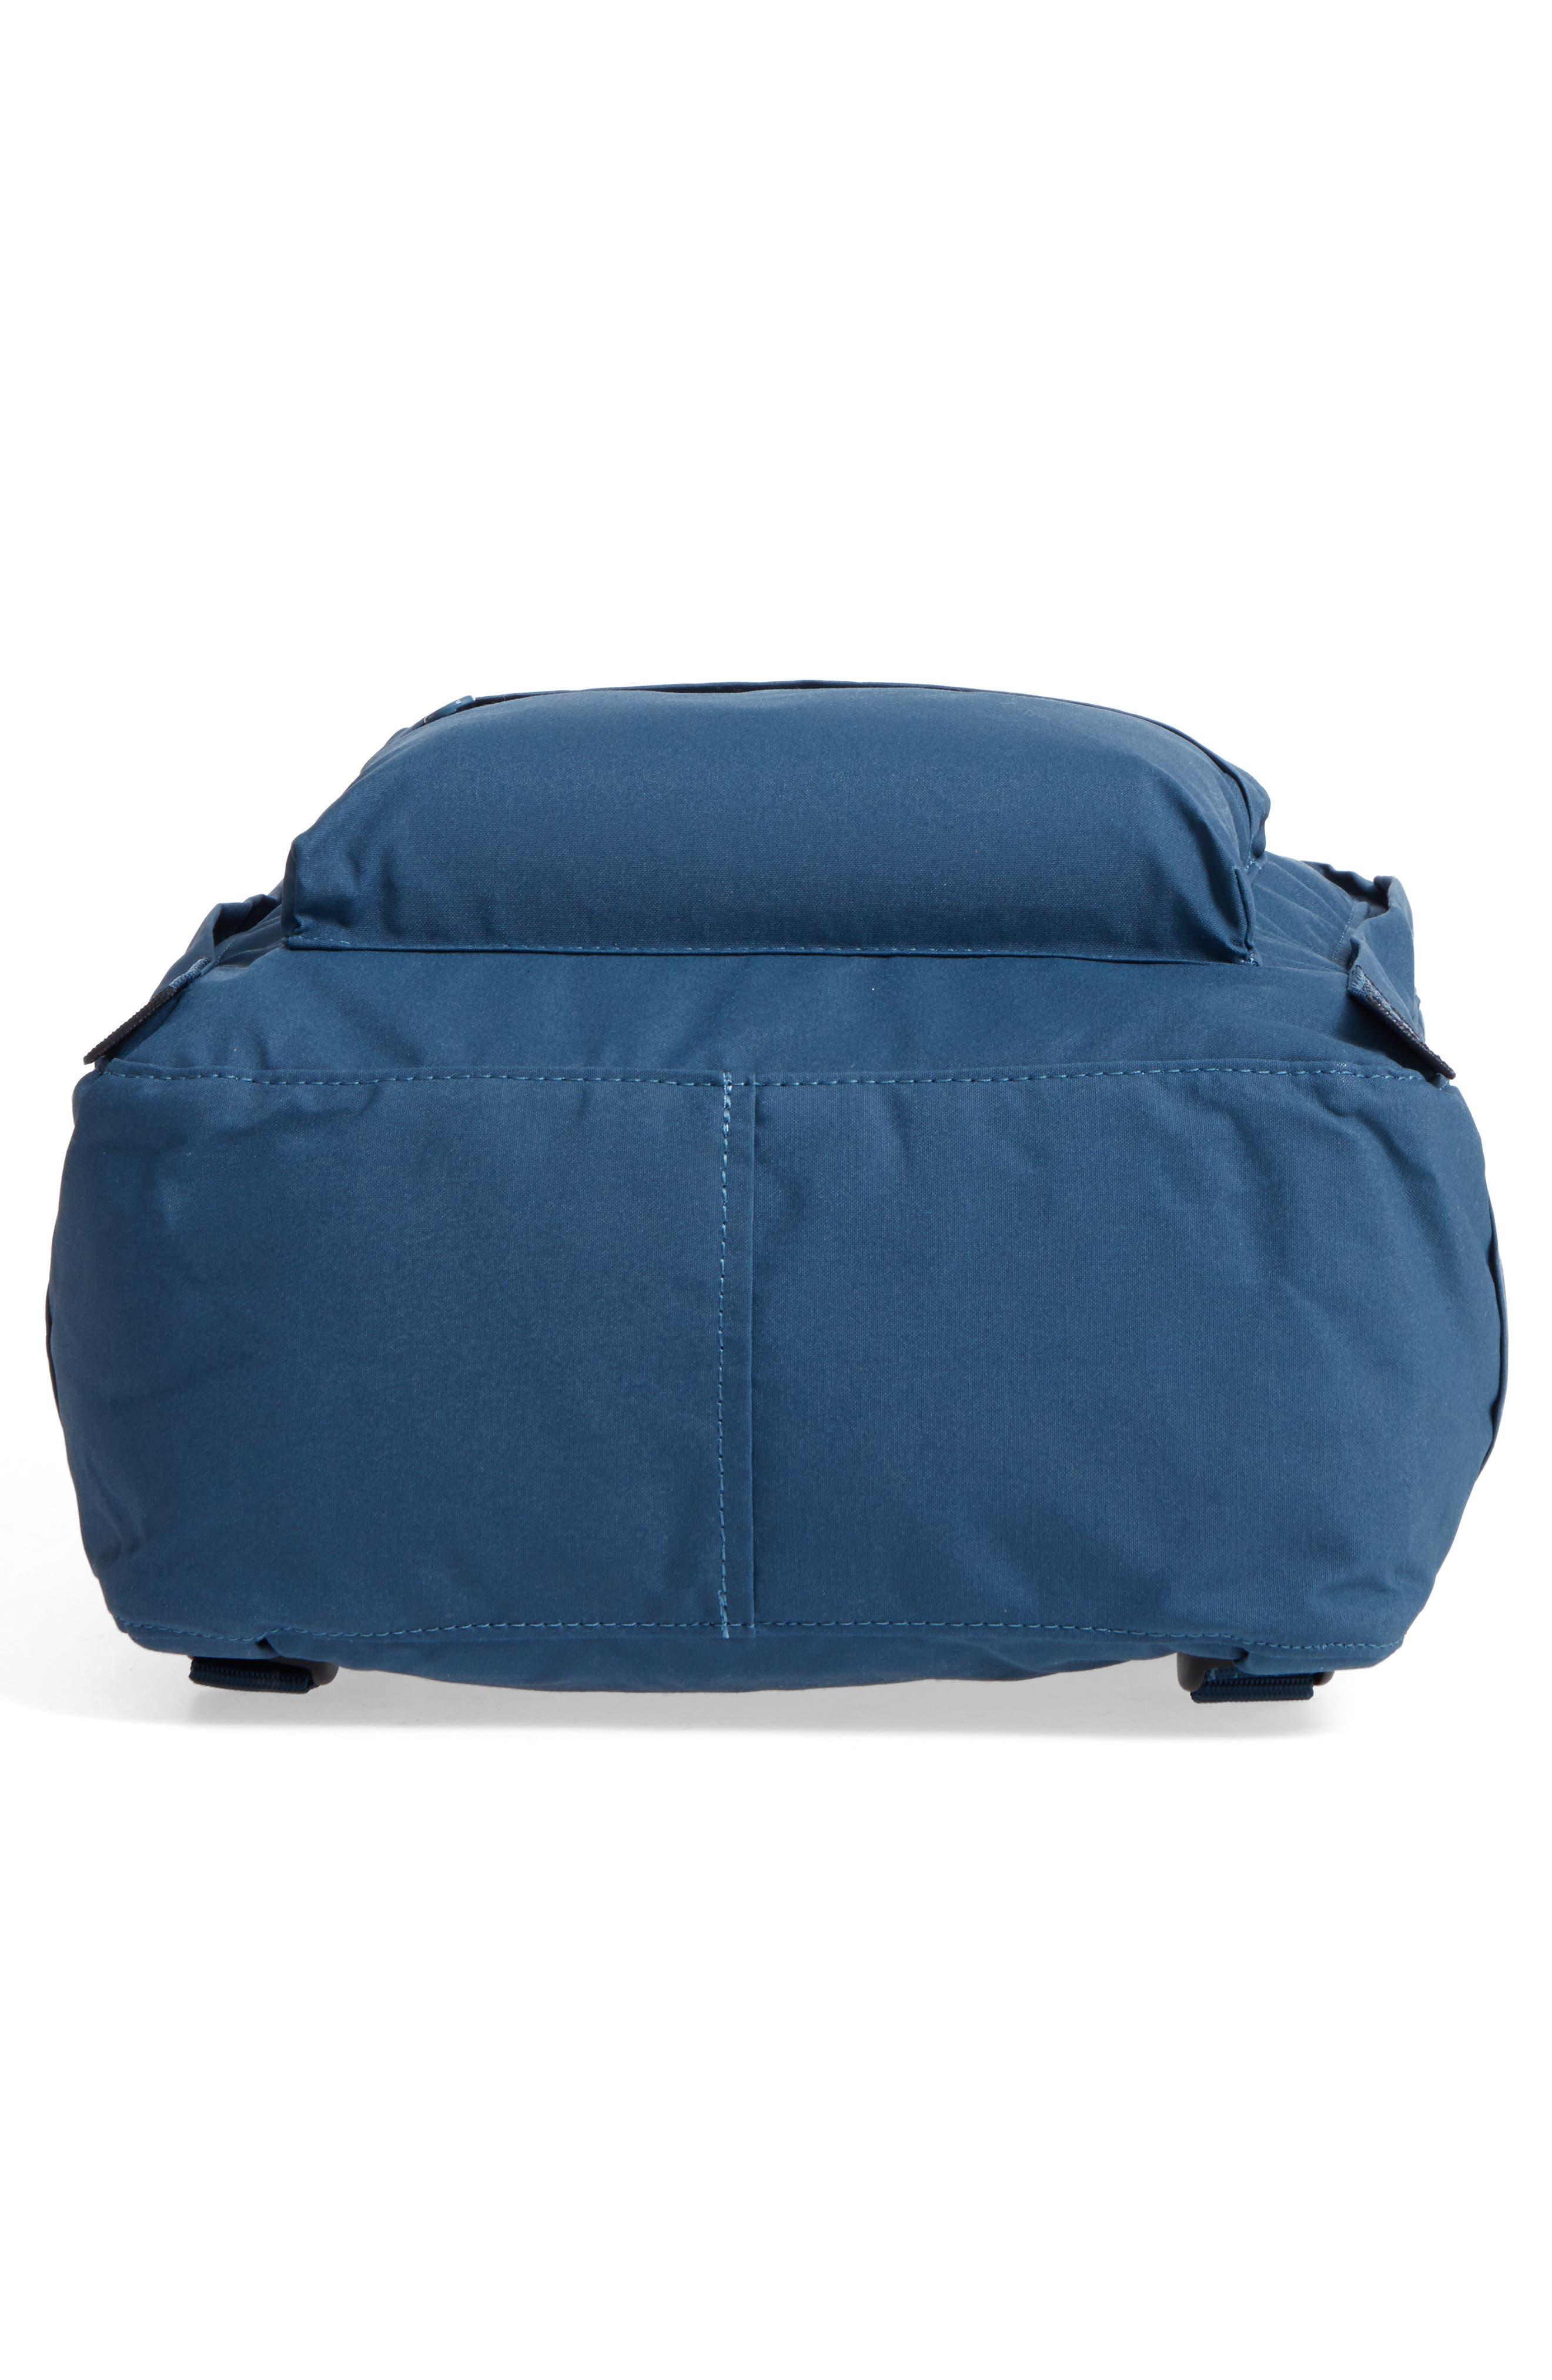 'Kånken' Water Resistant Backpack,                             Alternate thumbnail 312, color,